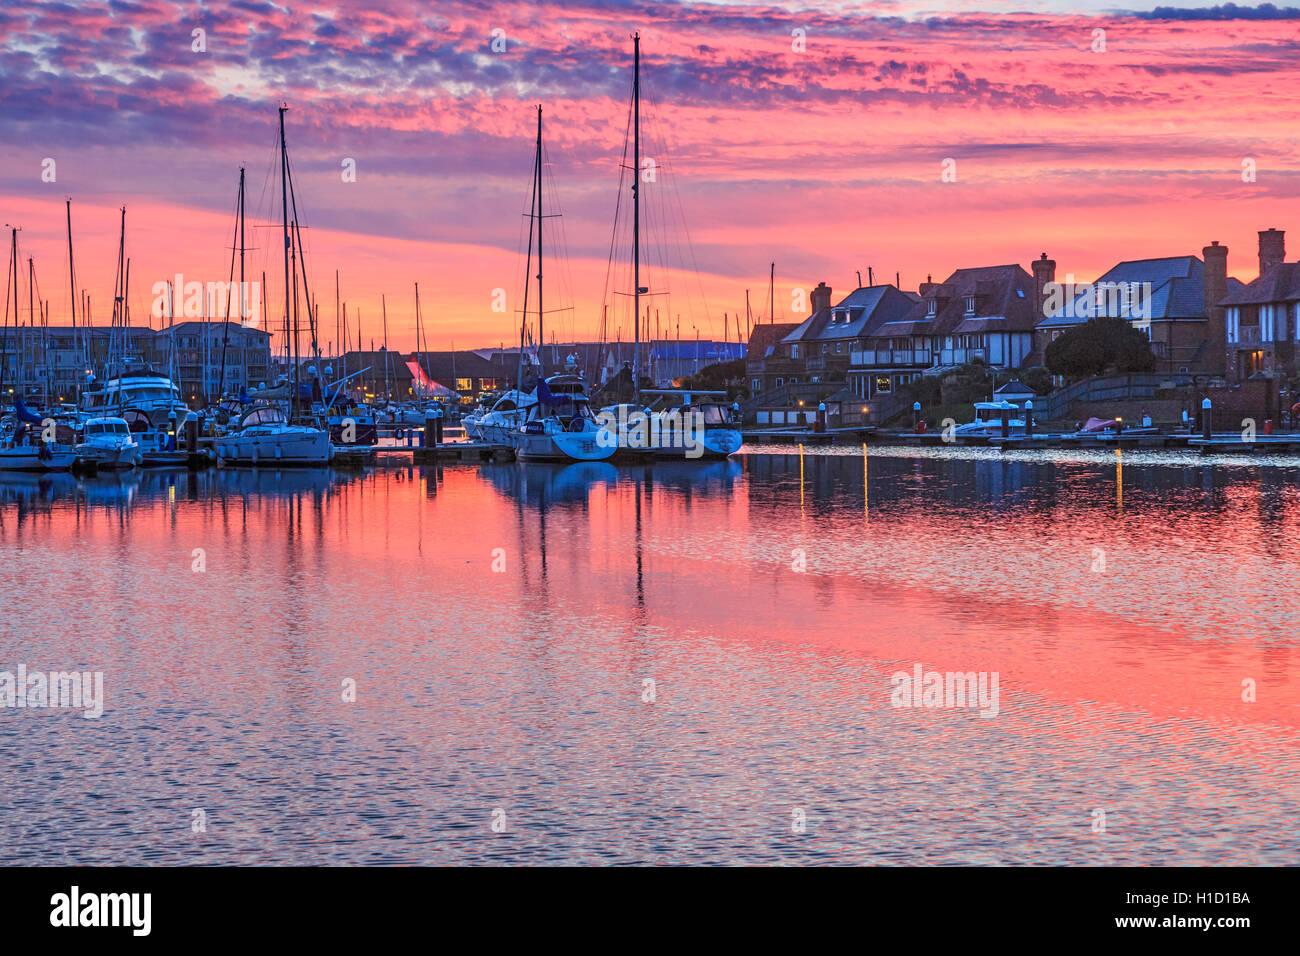 Souveräner Hafen Eastbourne in der Dämmerung Sonnenuntergang Stockbild